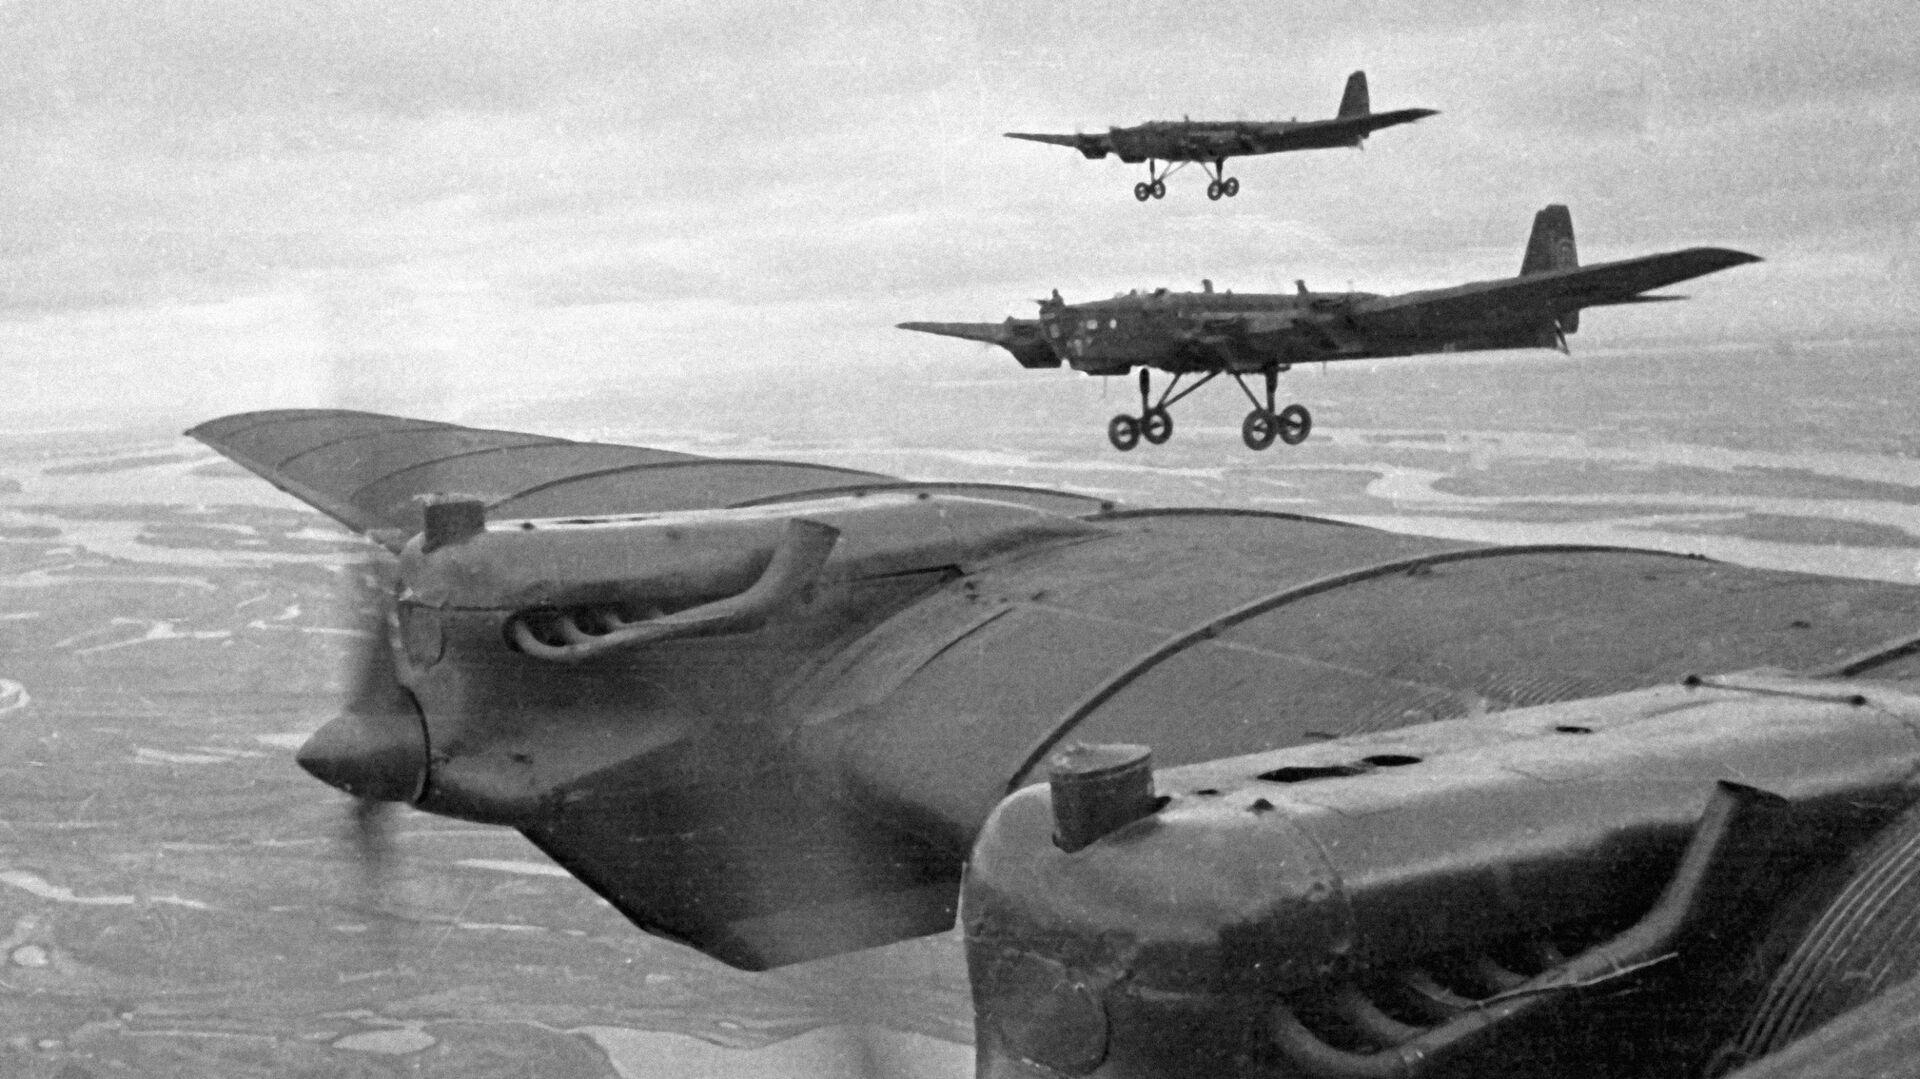 Radziecki ciężki samolot bombowy TB-3, ZSRR, 1936-1937 r.  - Sputnik Polska, 1920, 22.06.2021